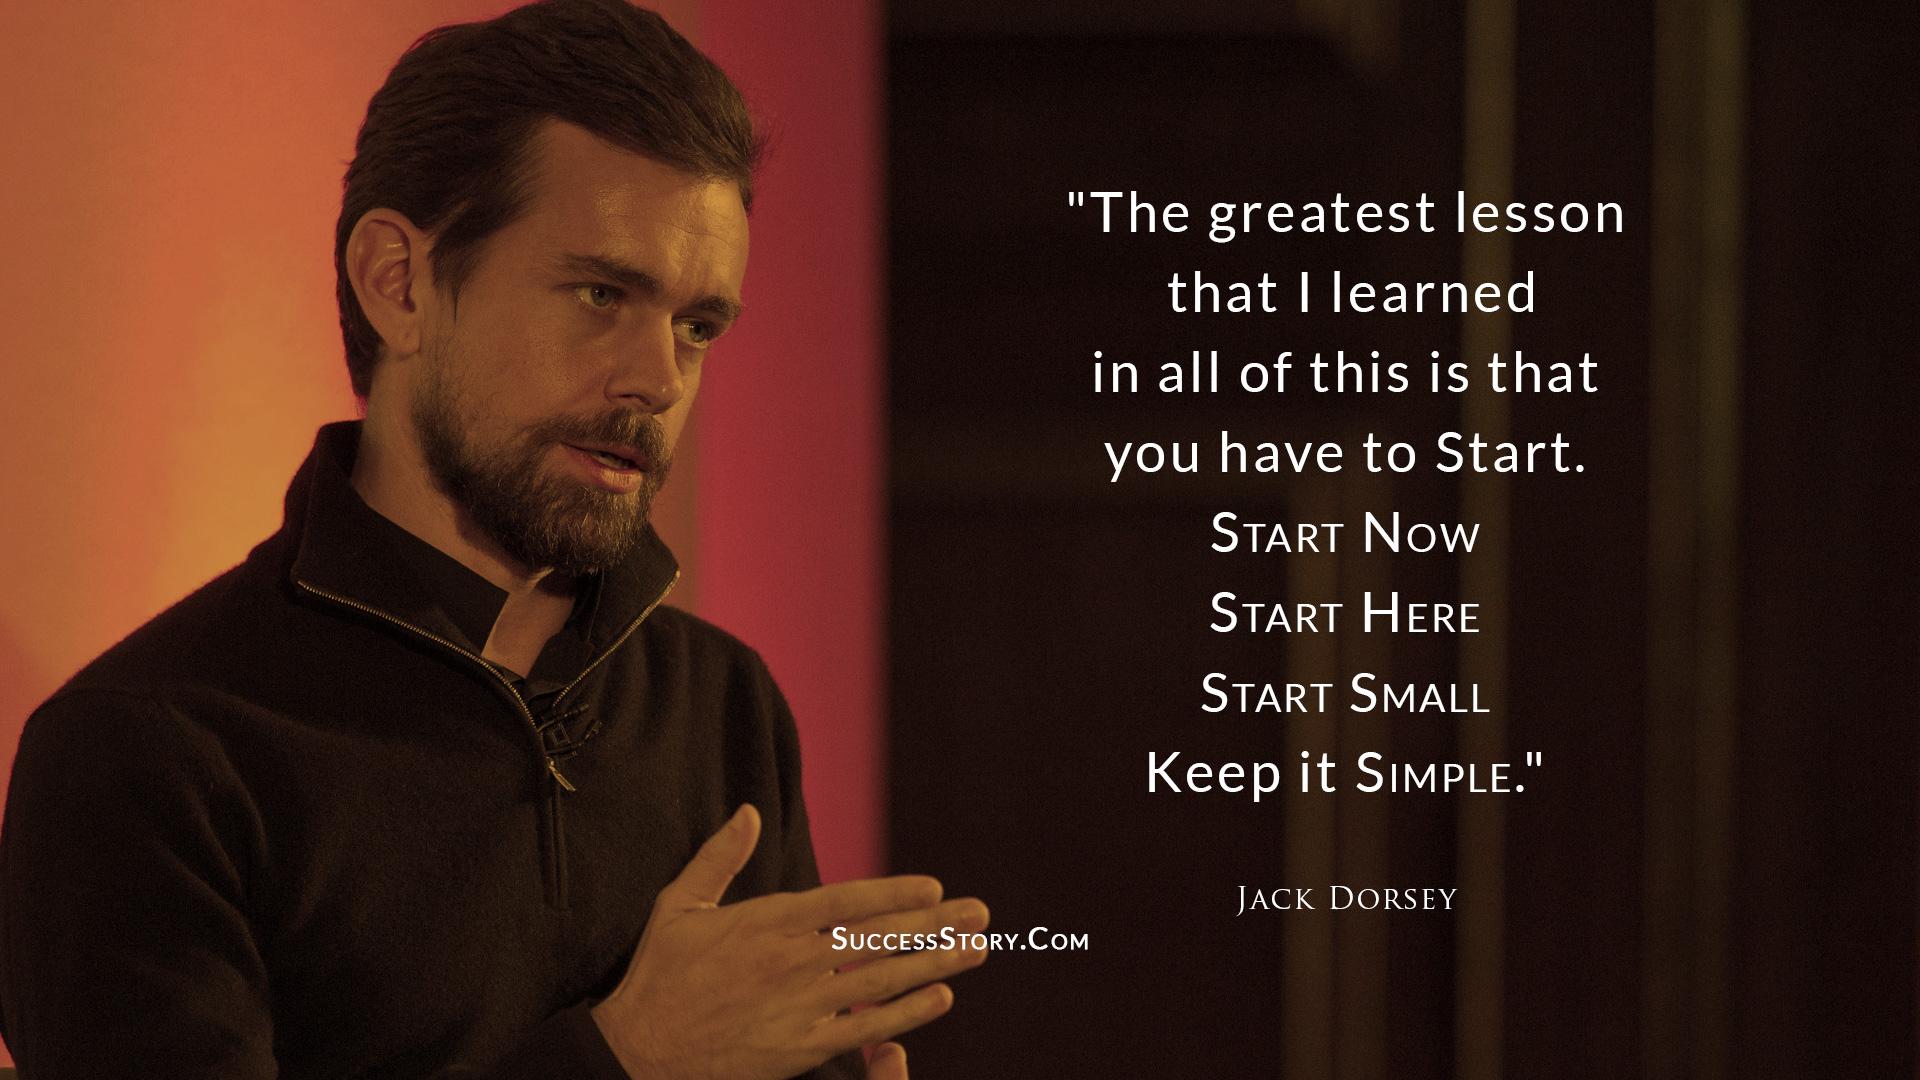 jack dorsey inspiring quotes